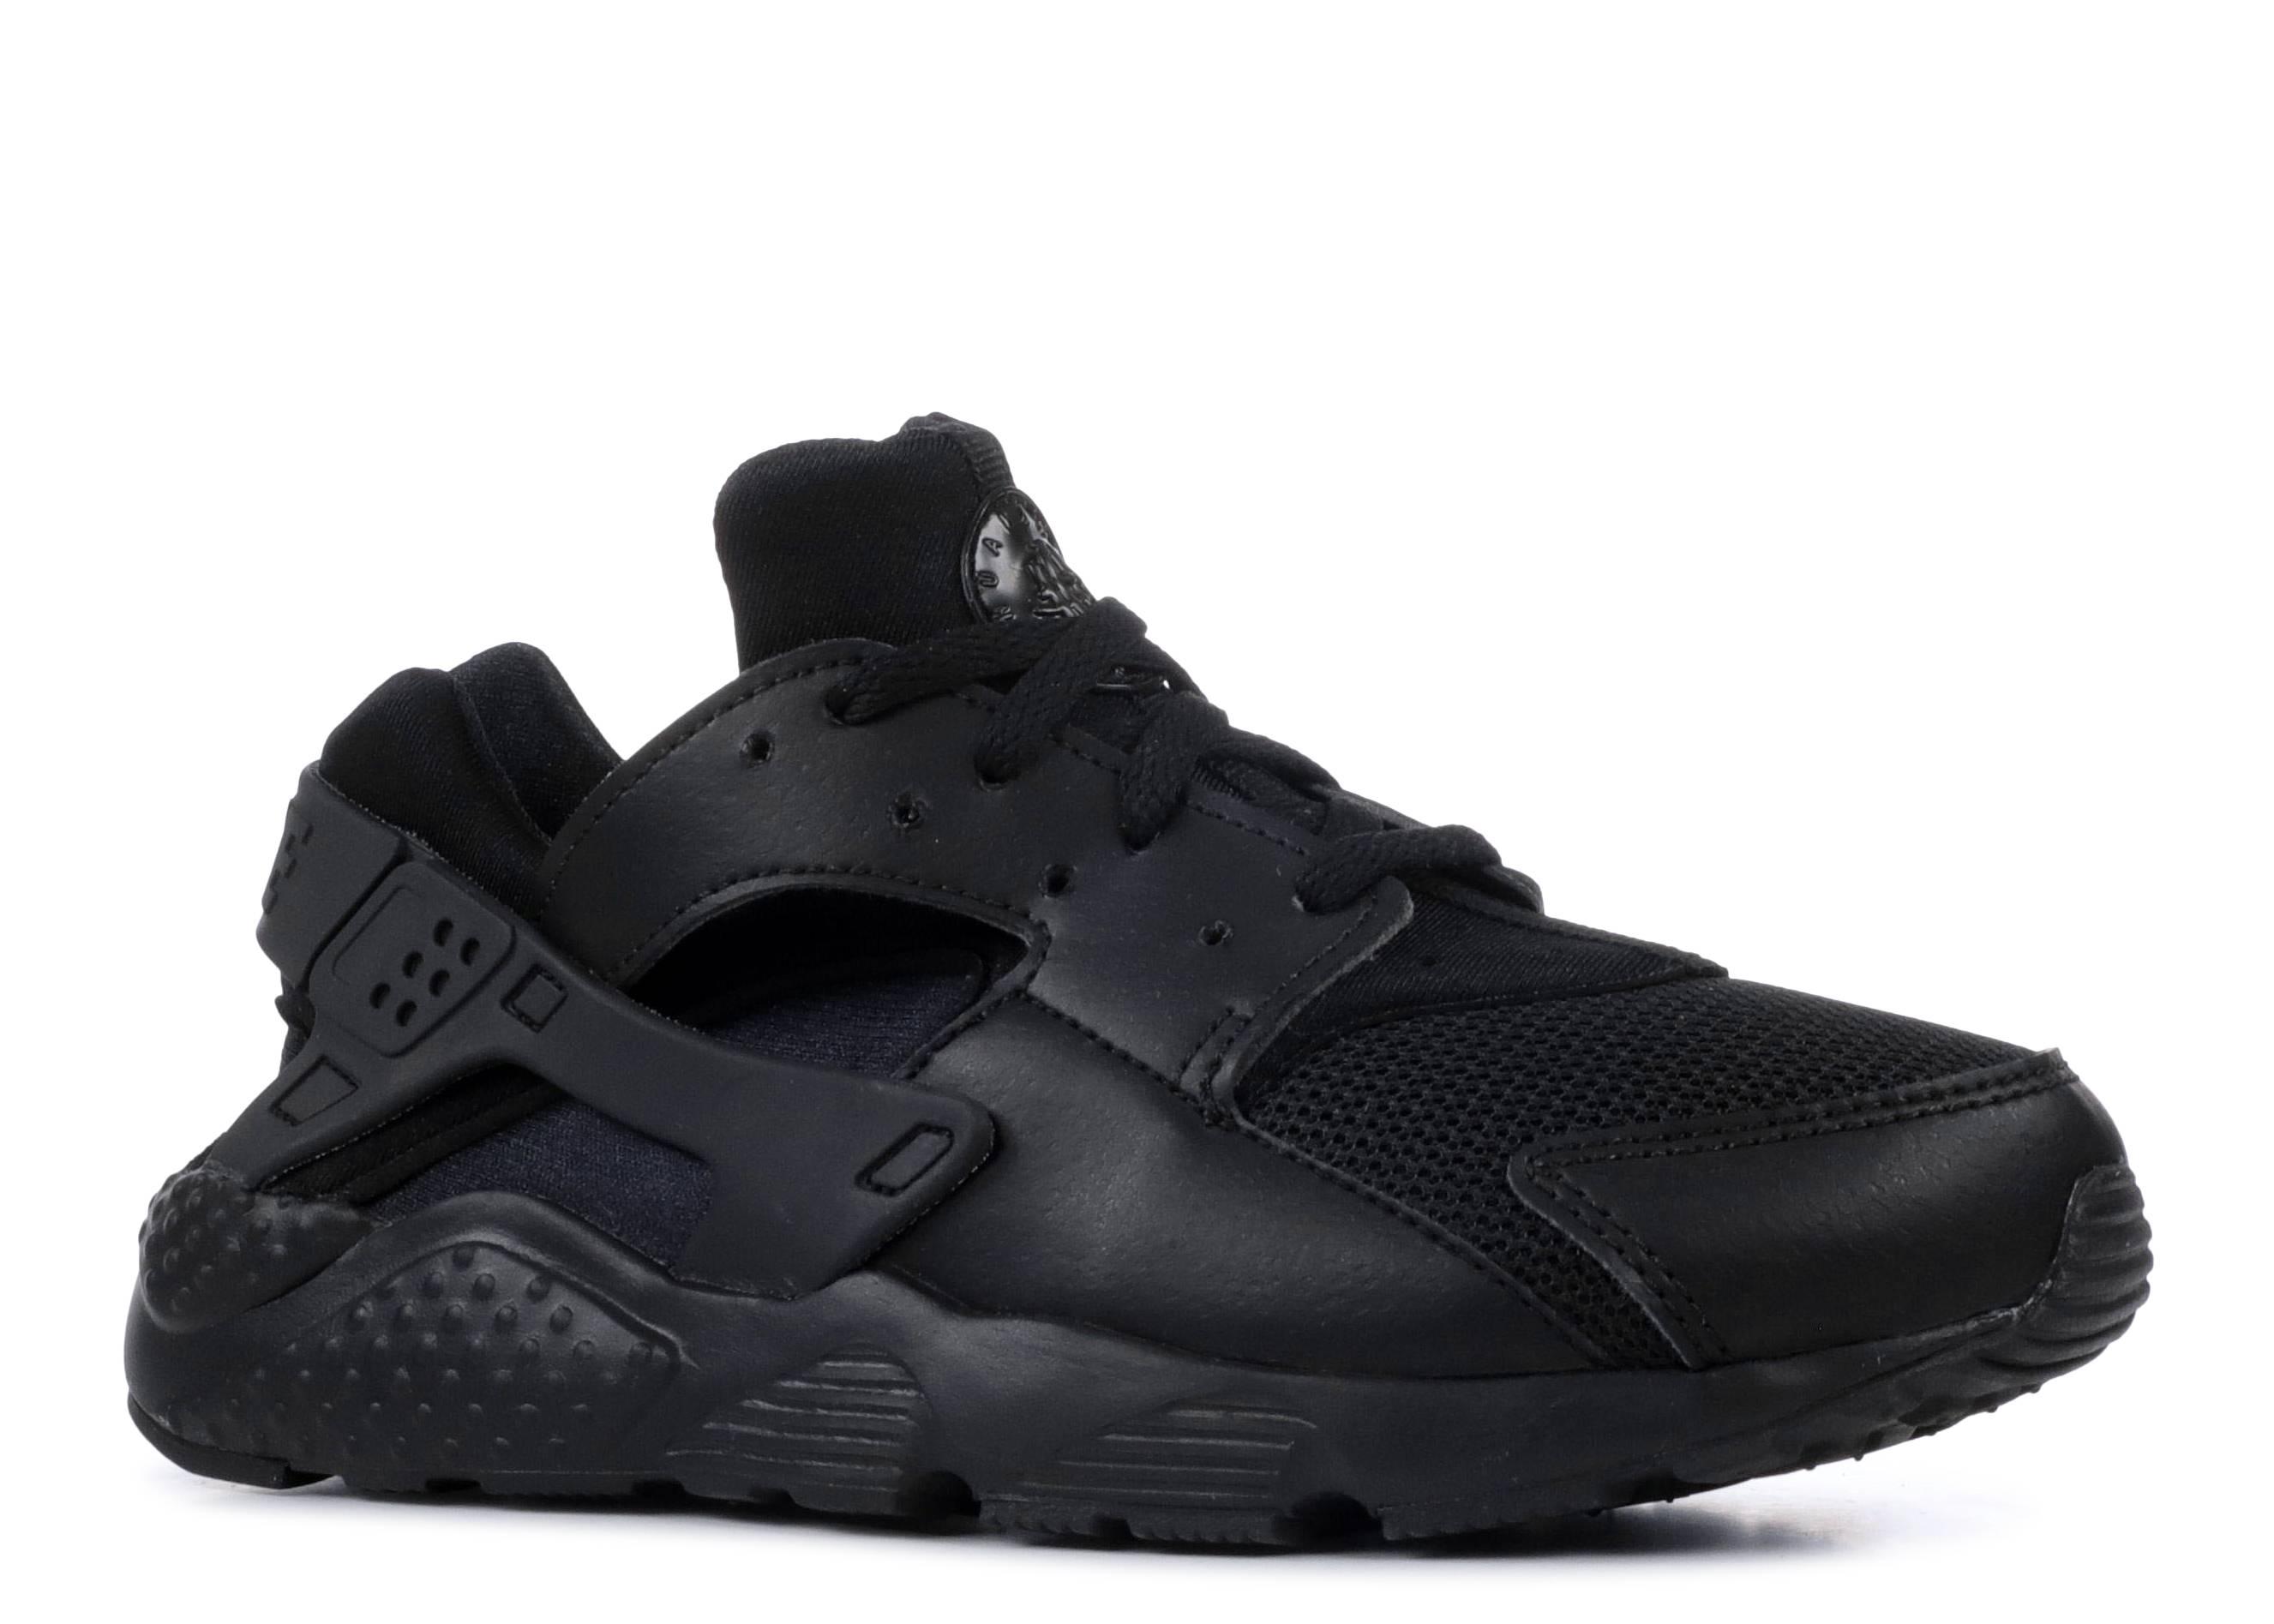 af6b0ab7cb0 Nike Huarache Run Ps - Nike - 704949 016 - black-black-black ...